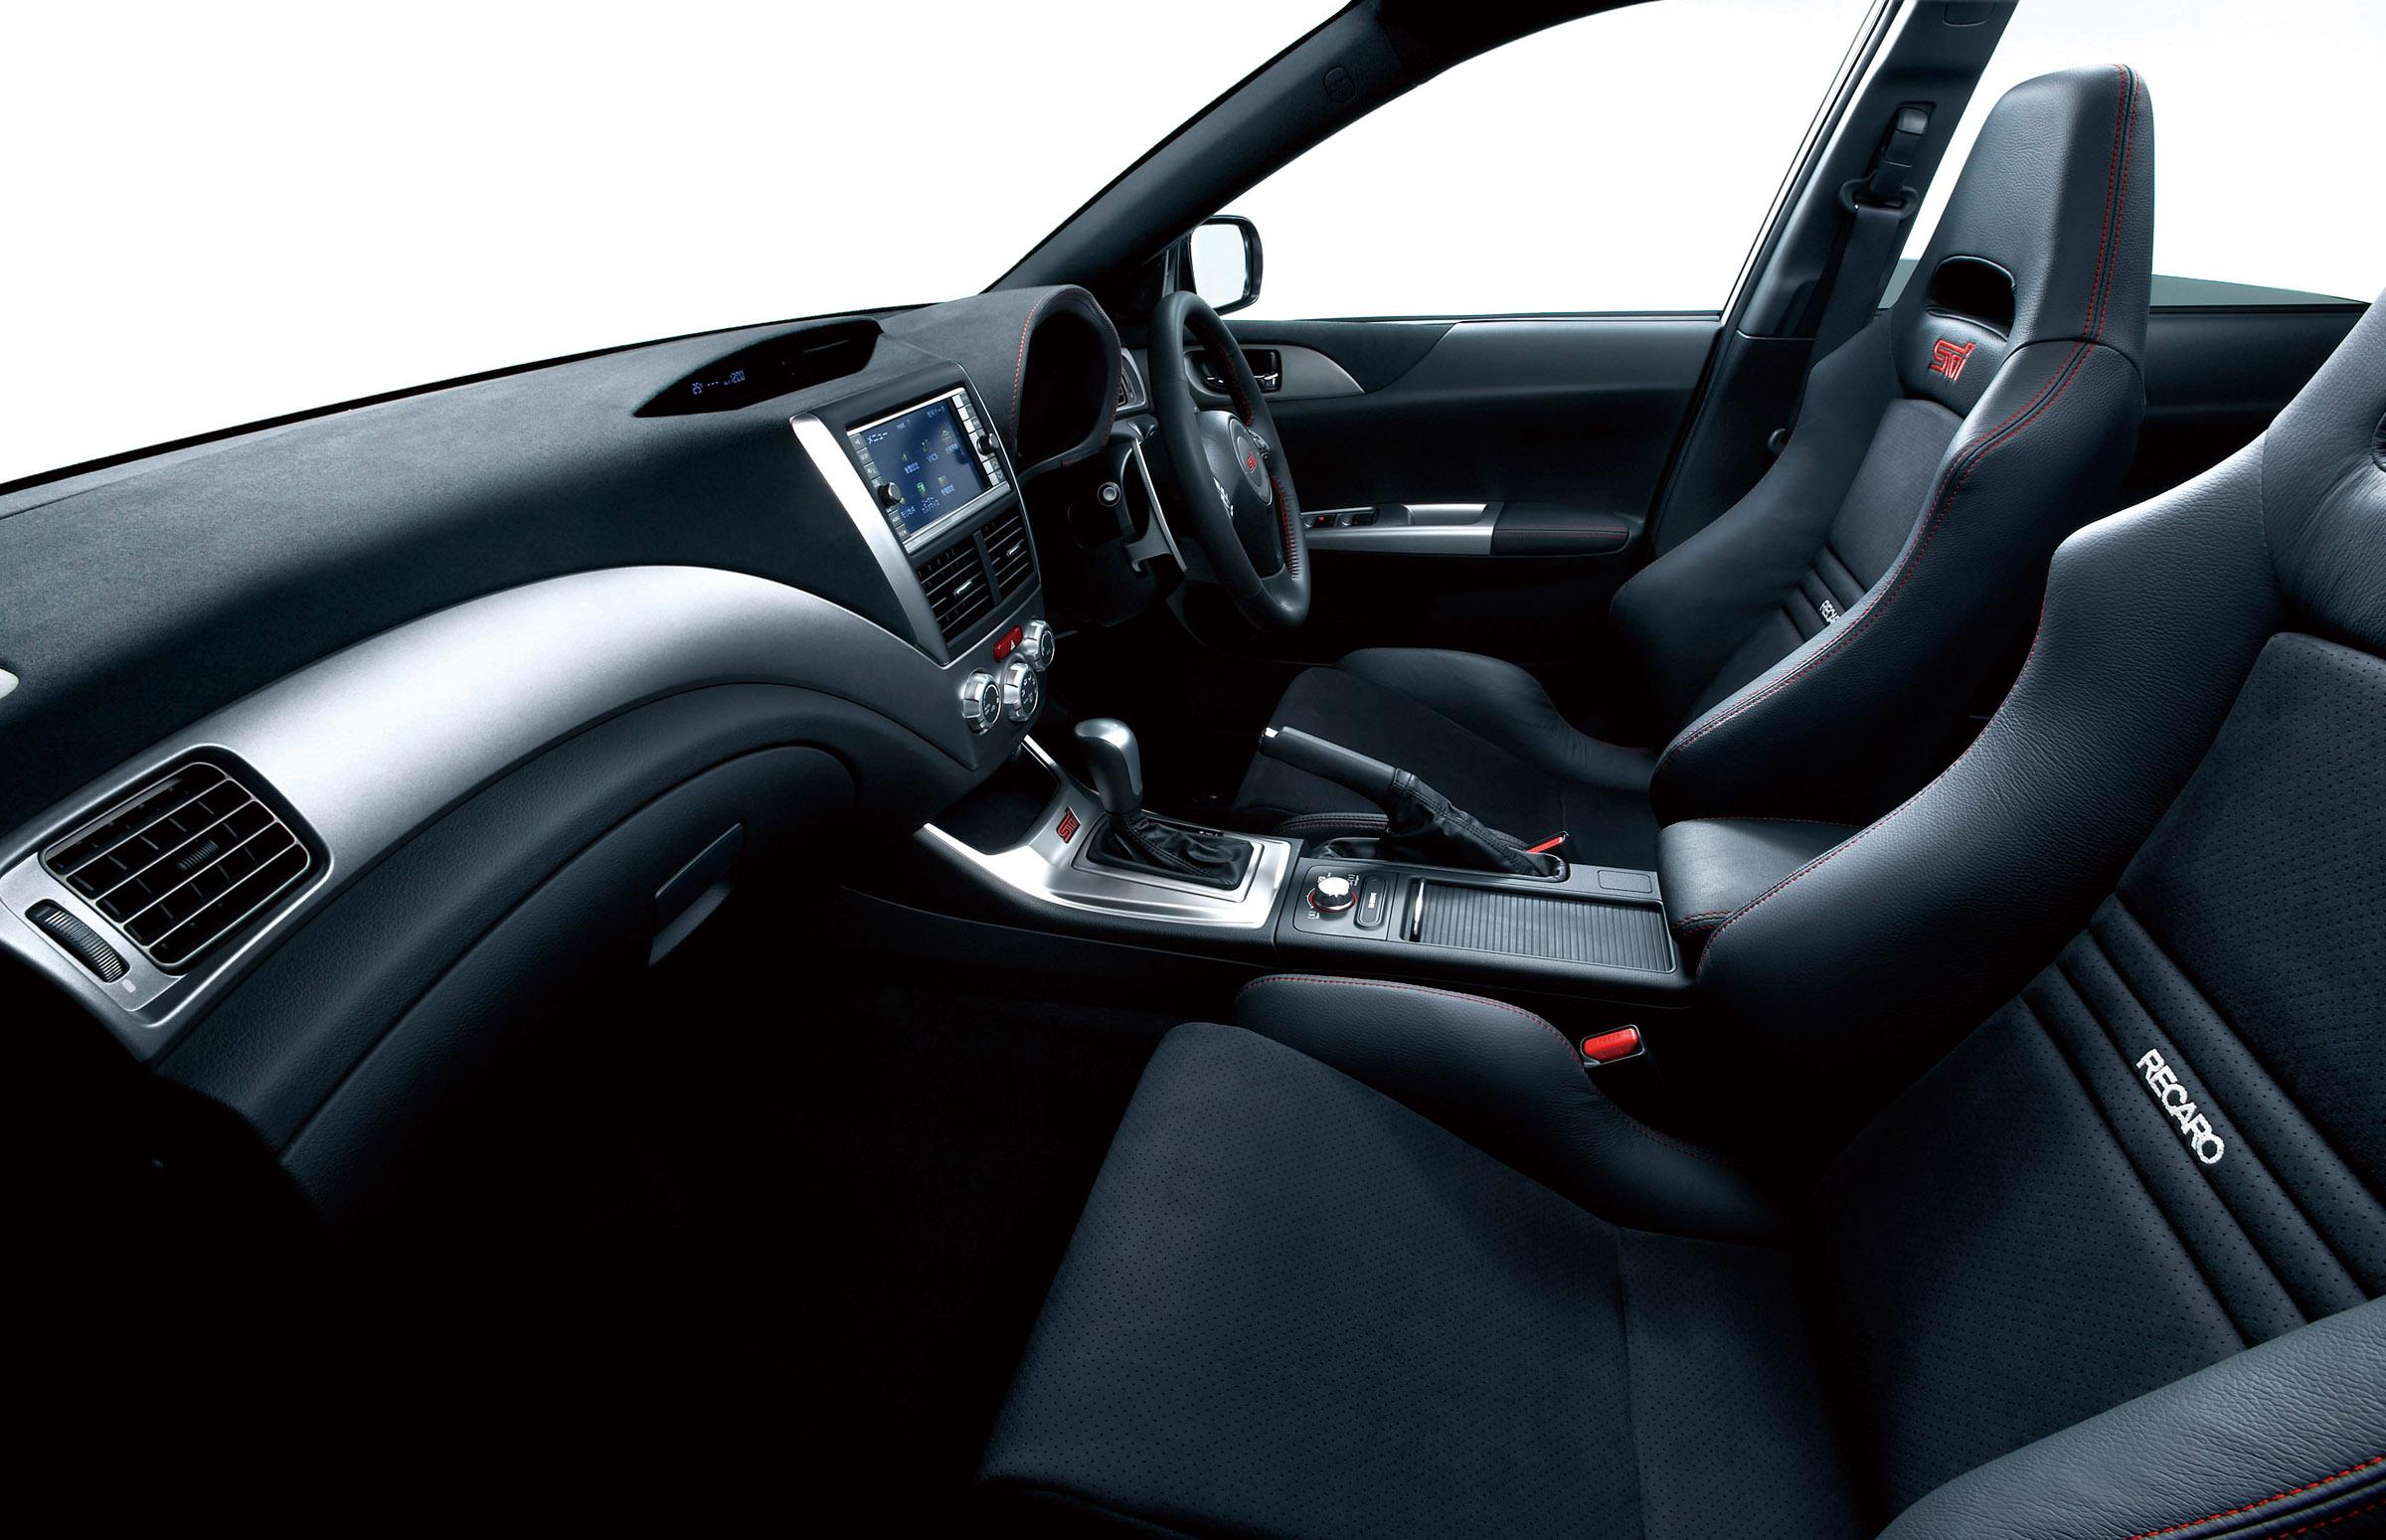 subaru impreza wrx sti carbon exclusive at tokyo motor show 2009. Black Bedroom Furniture Sets. Home Design Ideas